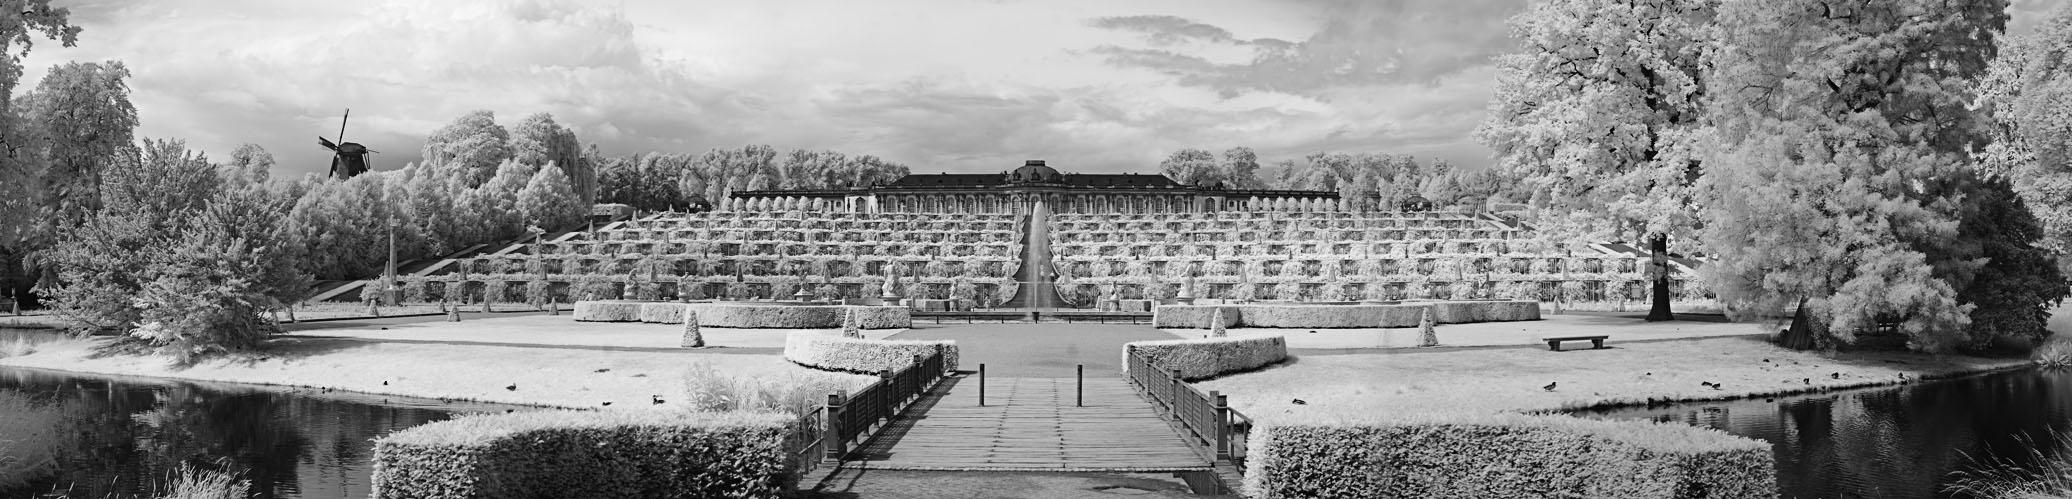 Schloß Sanssouci (IR Panorama)